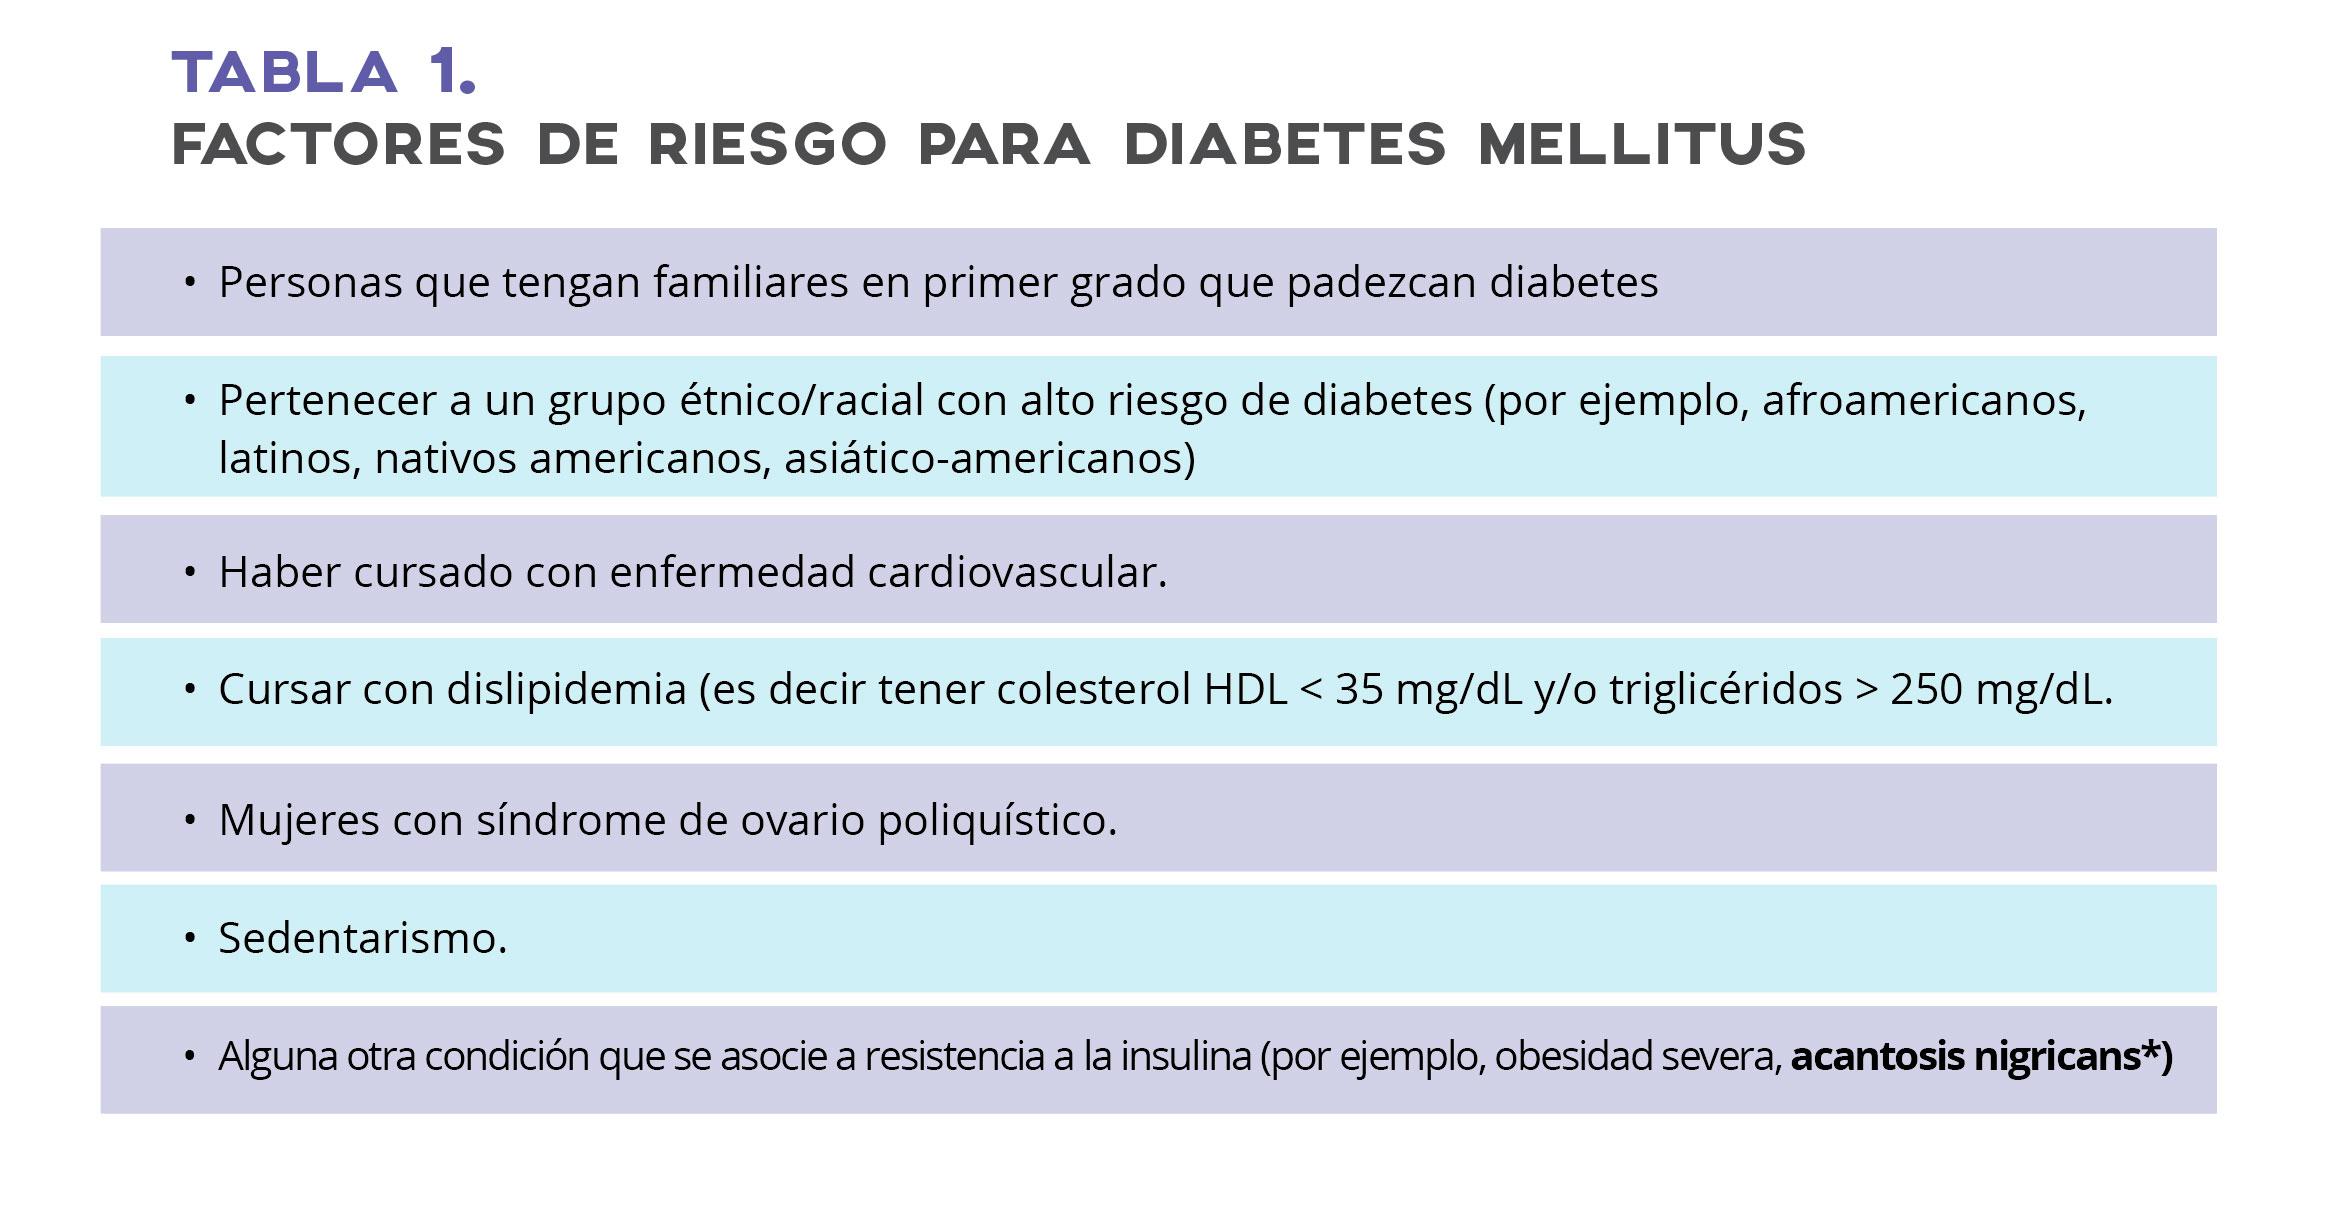 Factores de riesgo para Diabetes Mellitus